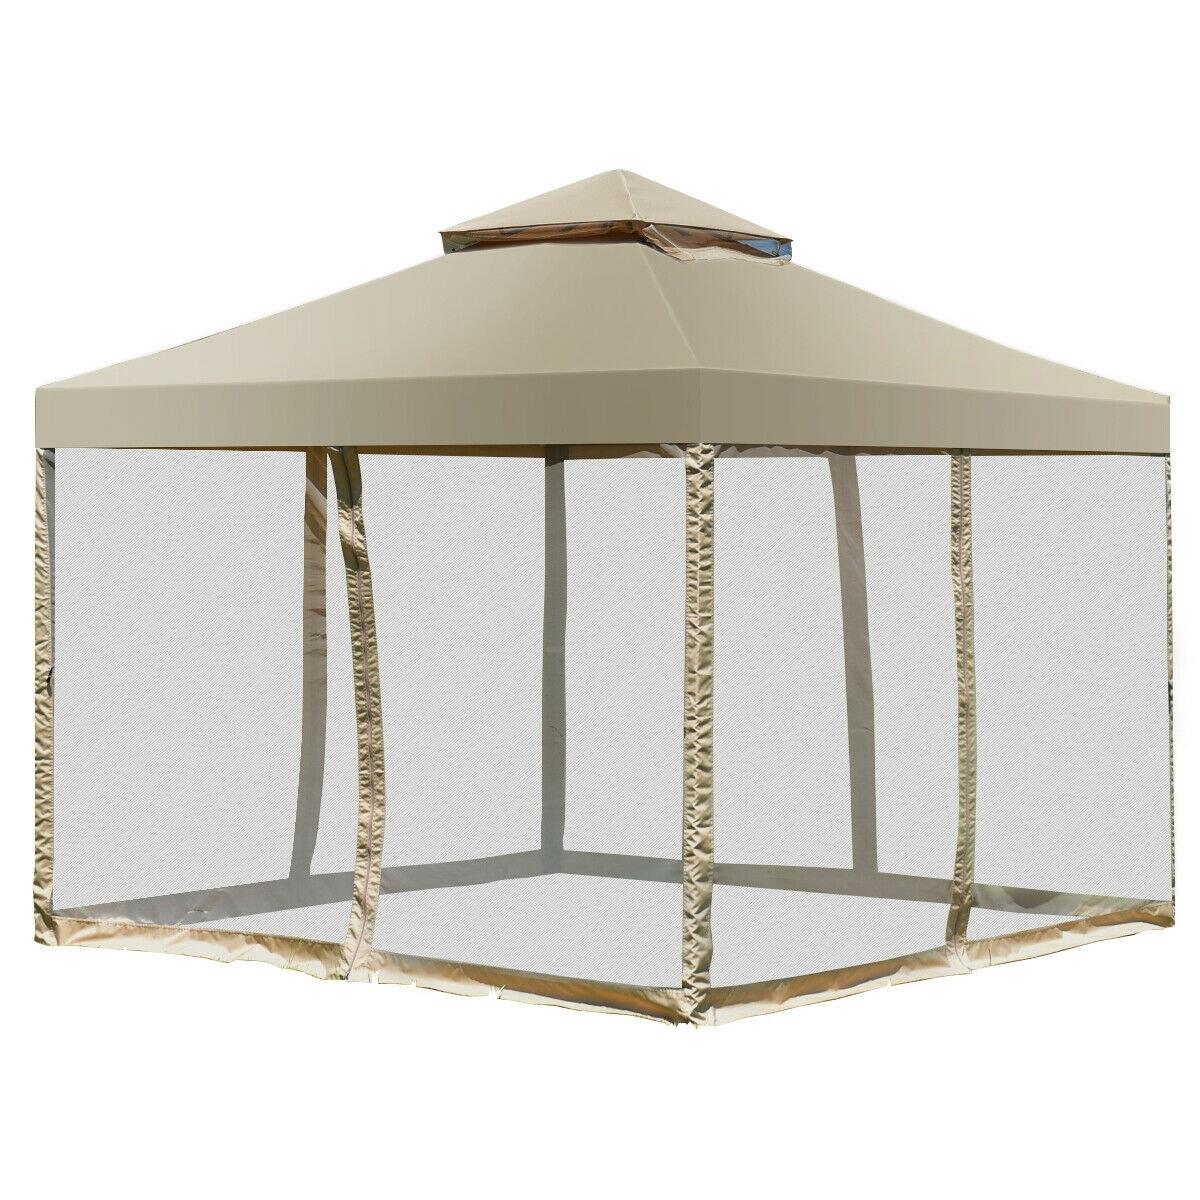 2 Tiers 11.5/' x 11.5/' Patio Garden Gazebo Canopy Tent Shelter Awning Waterproof